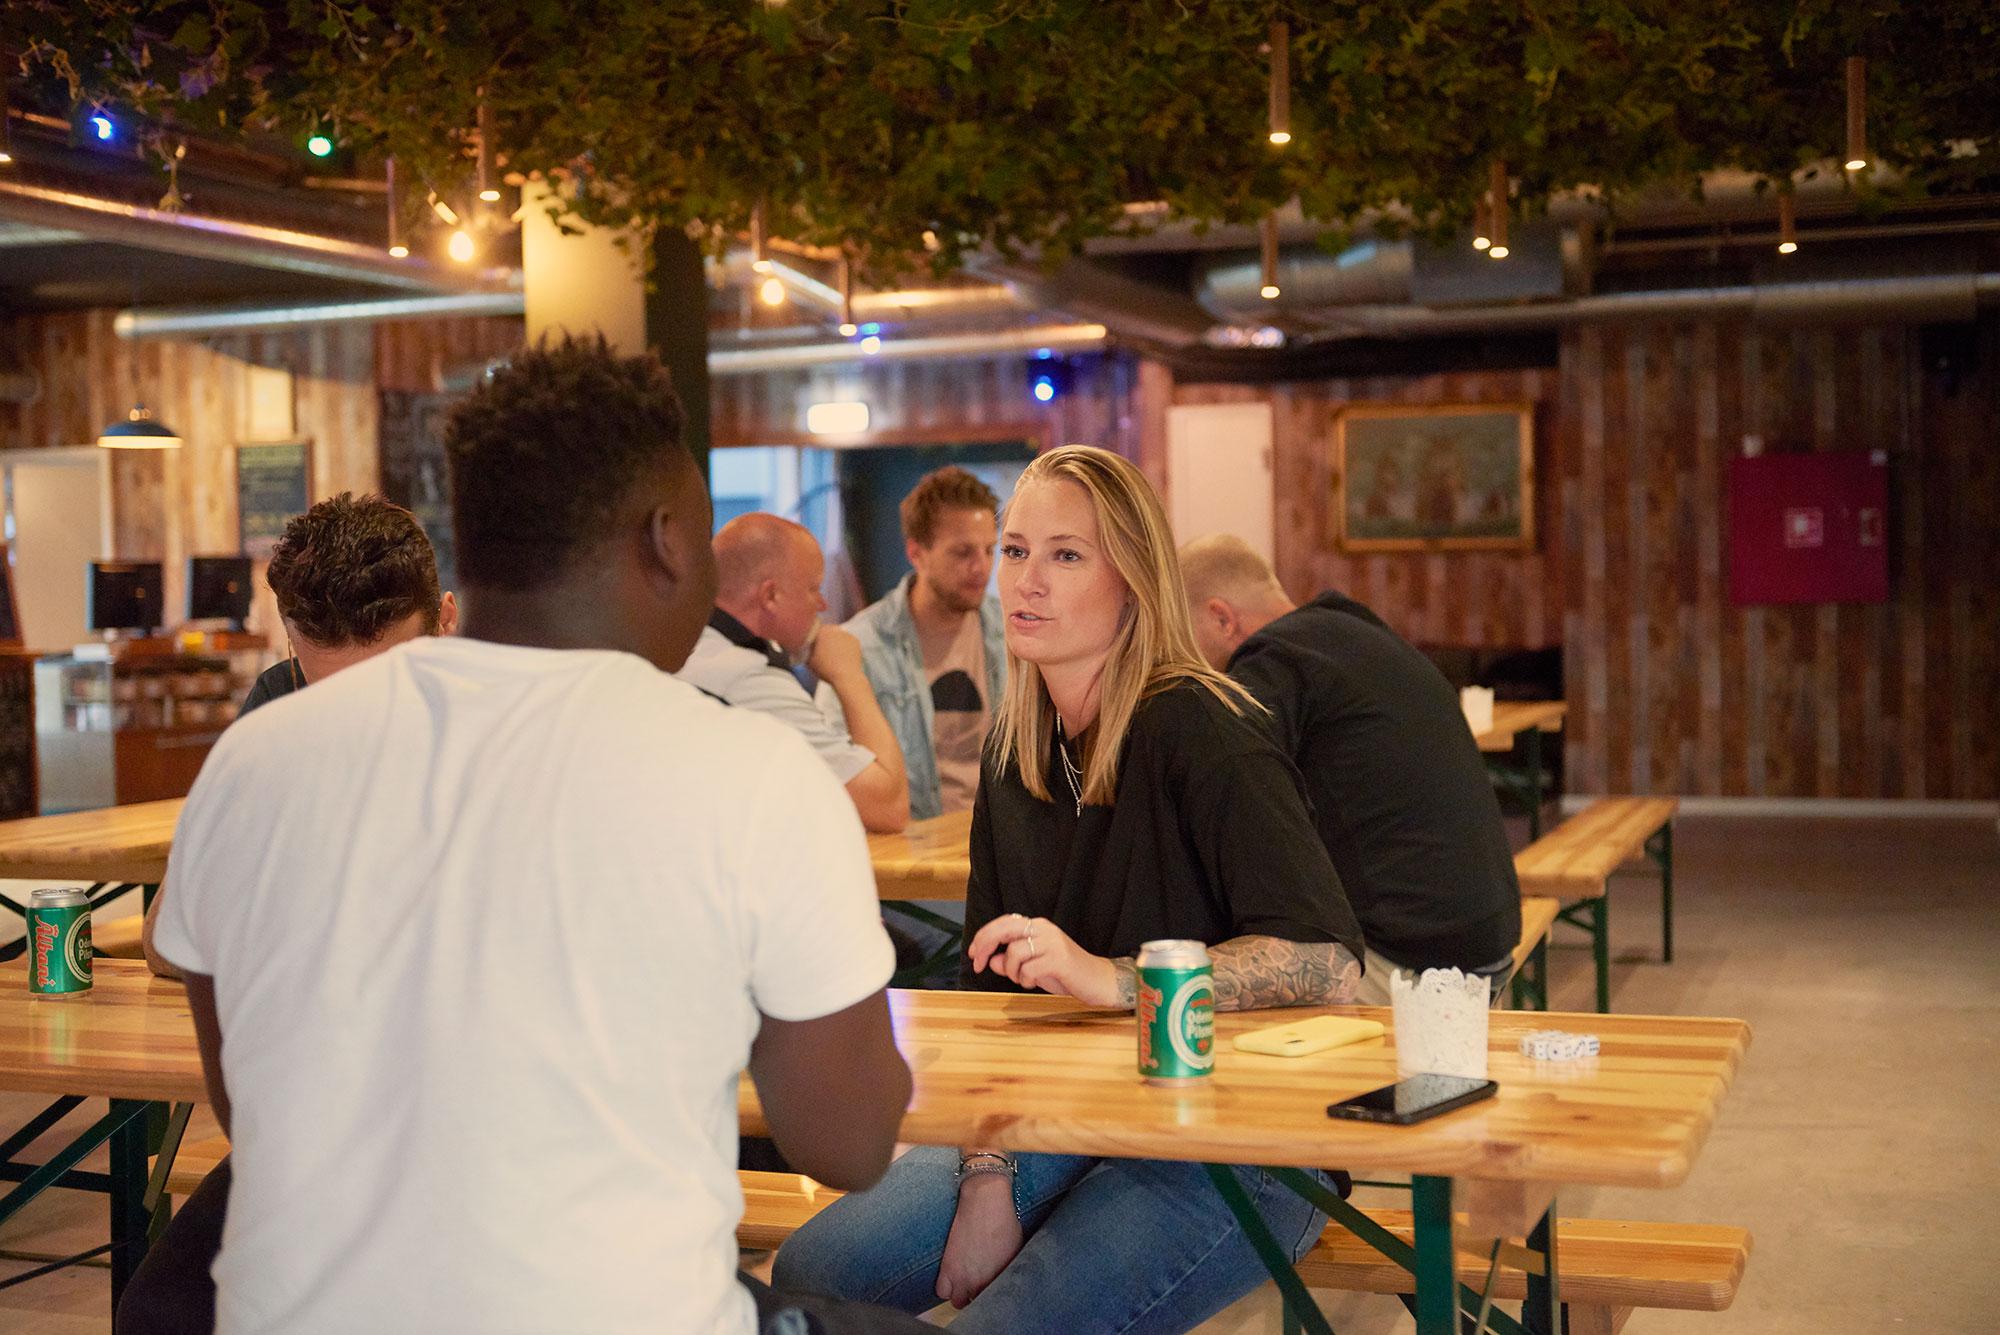 enjoy good times at Urbancamper - eat, drink, relax, play, socialise